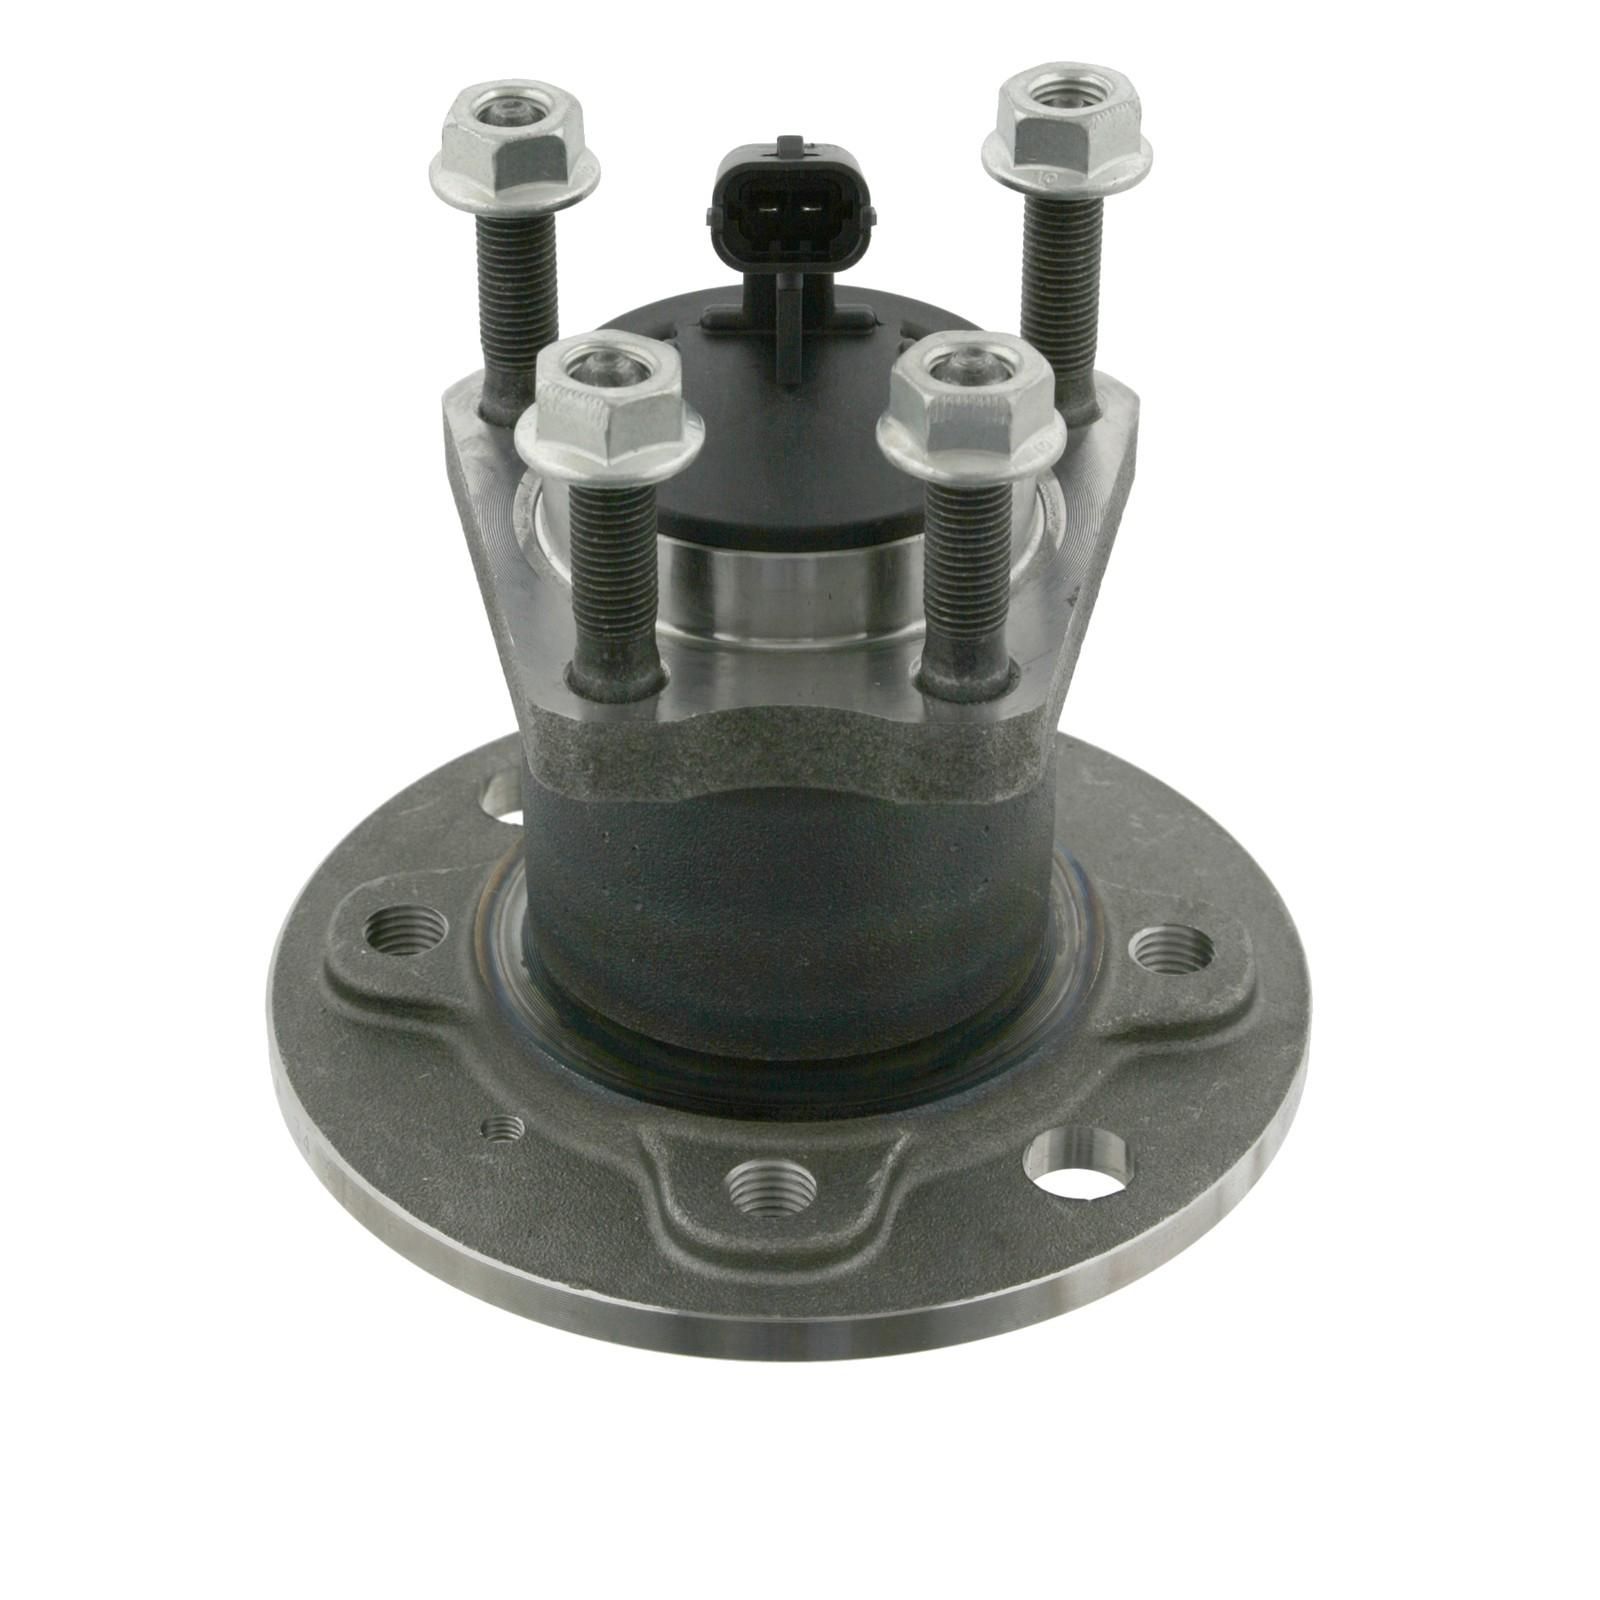 FEBI 27384 Radlagersatz Radnabe OPEL Astra H 1.2-2.0 / 1.3-1.9 CDTI 4-Loch Felge hinten